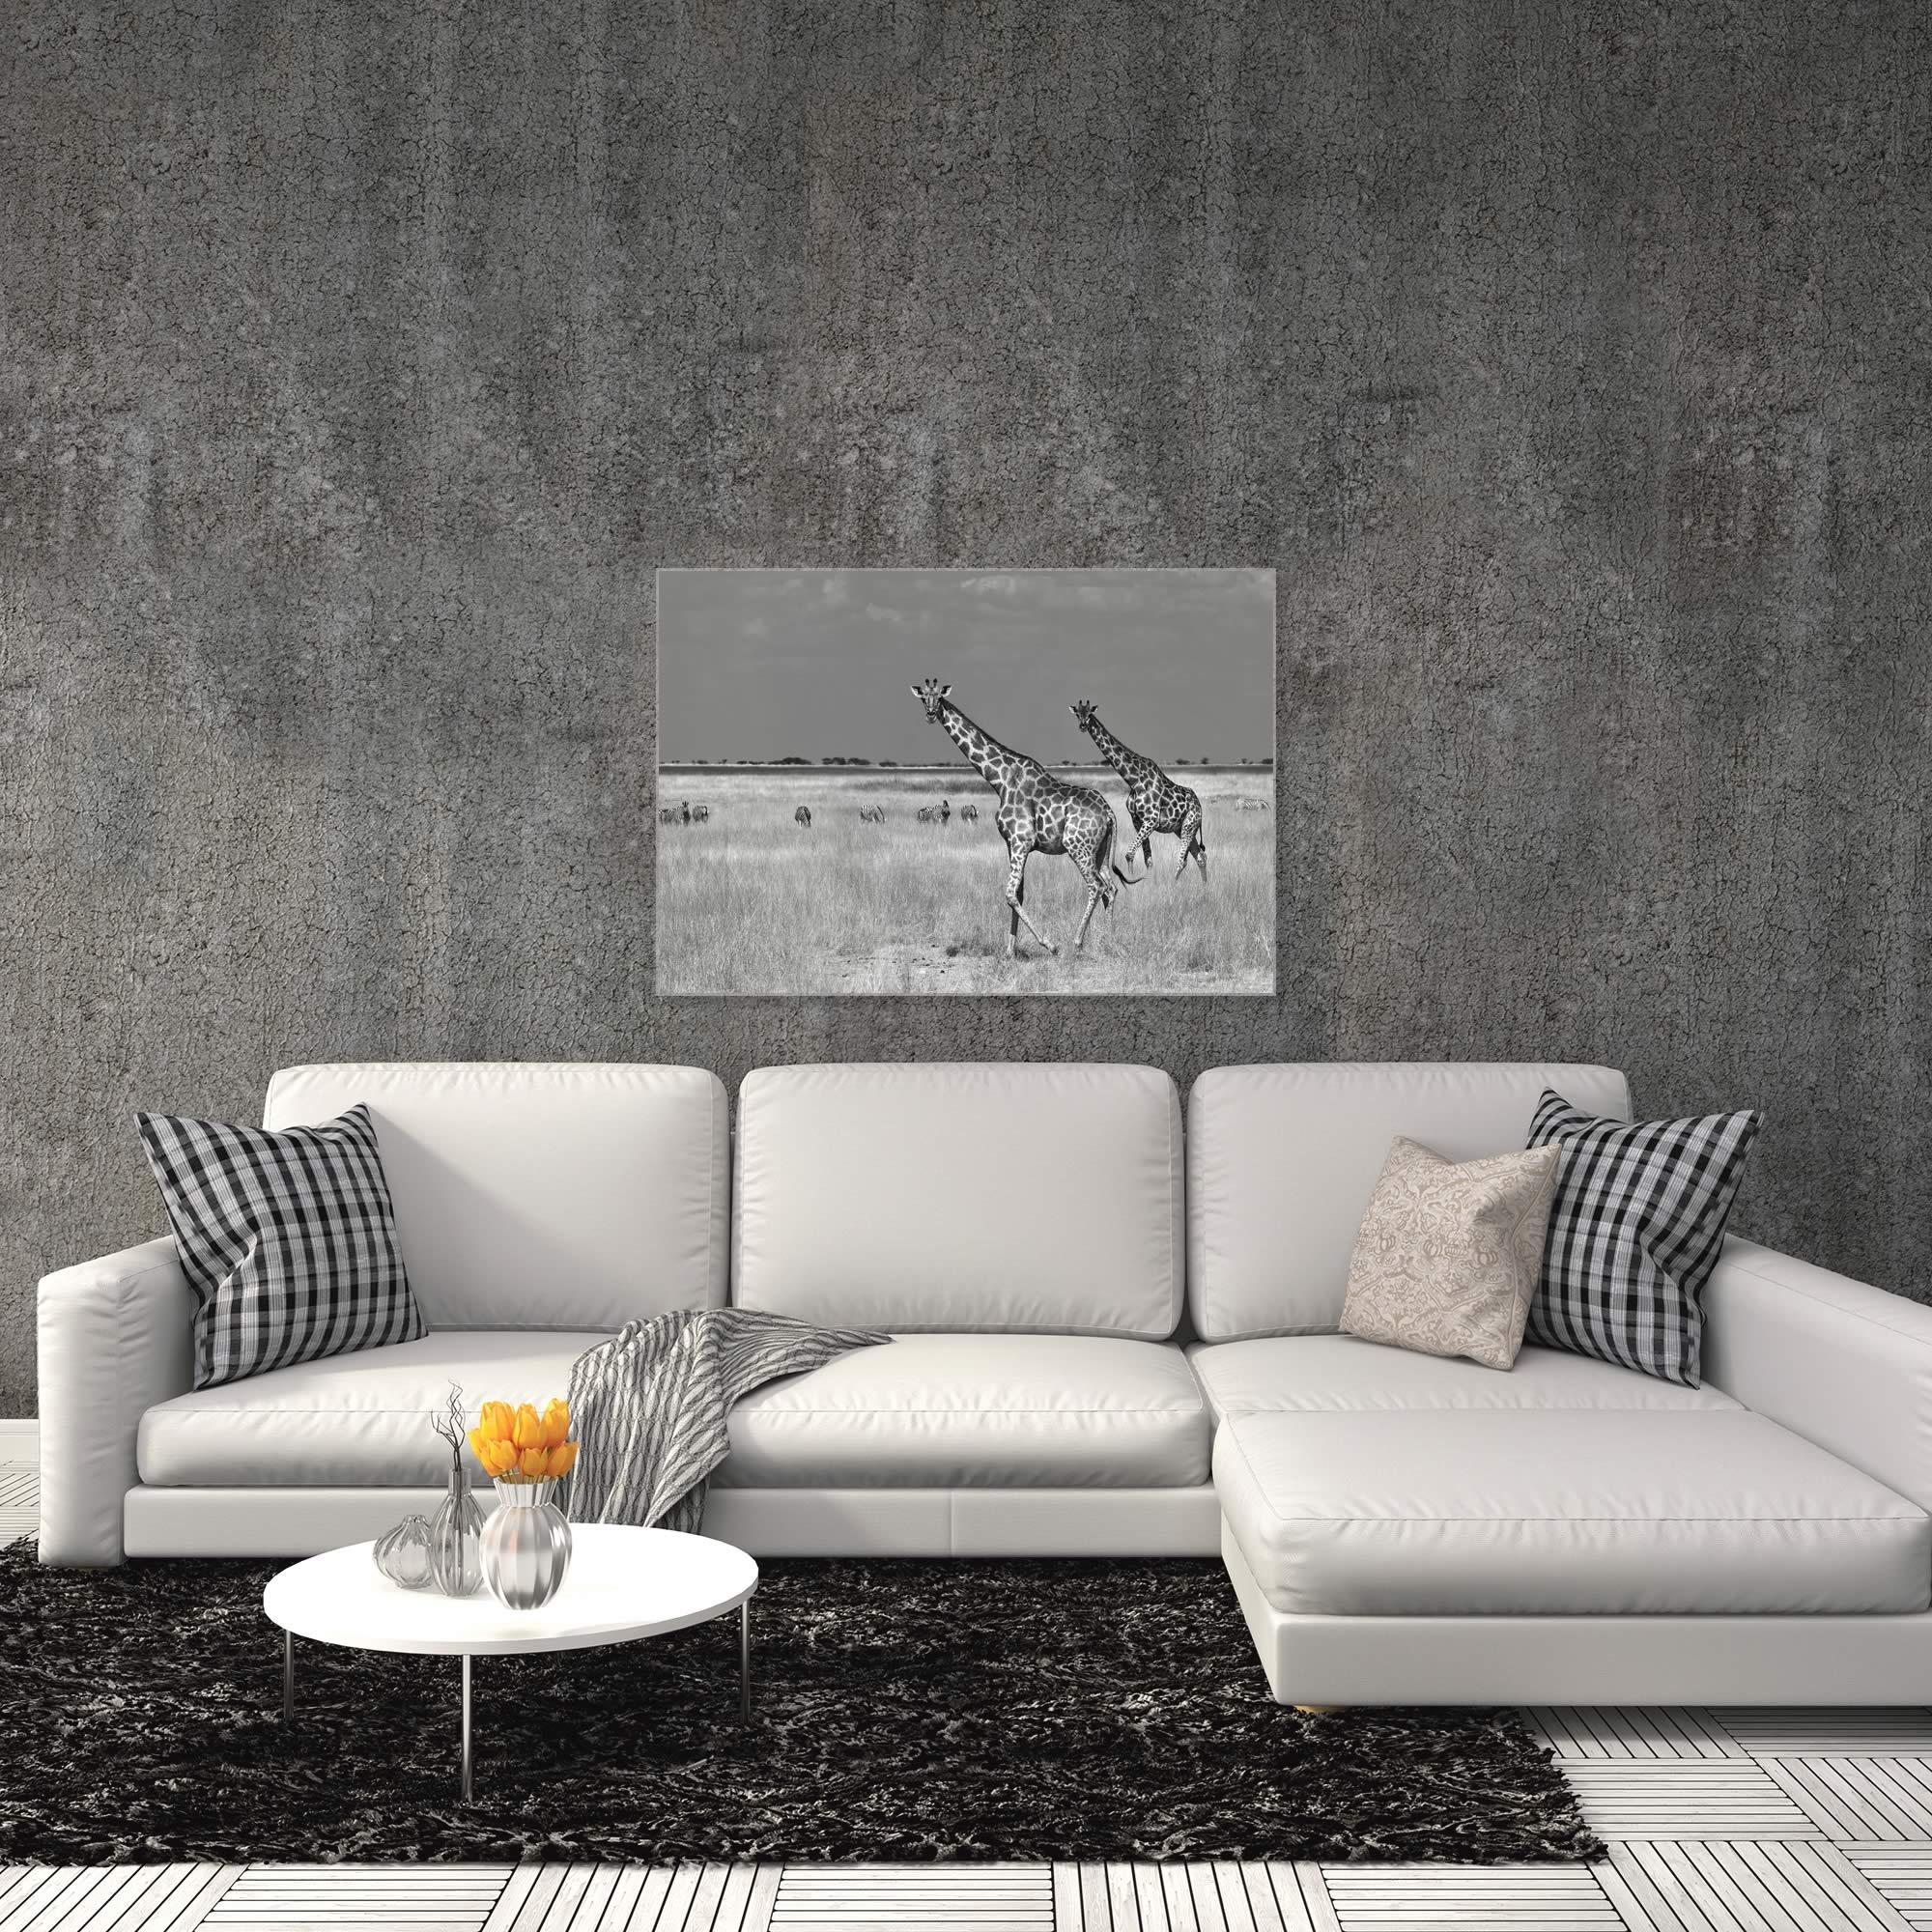 Savanna Favorites by Mathilde Guillemot - Giraffe and Zebra Art on Metal or Acrylic - Alternate View 3